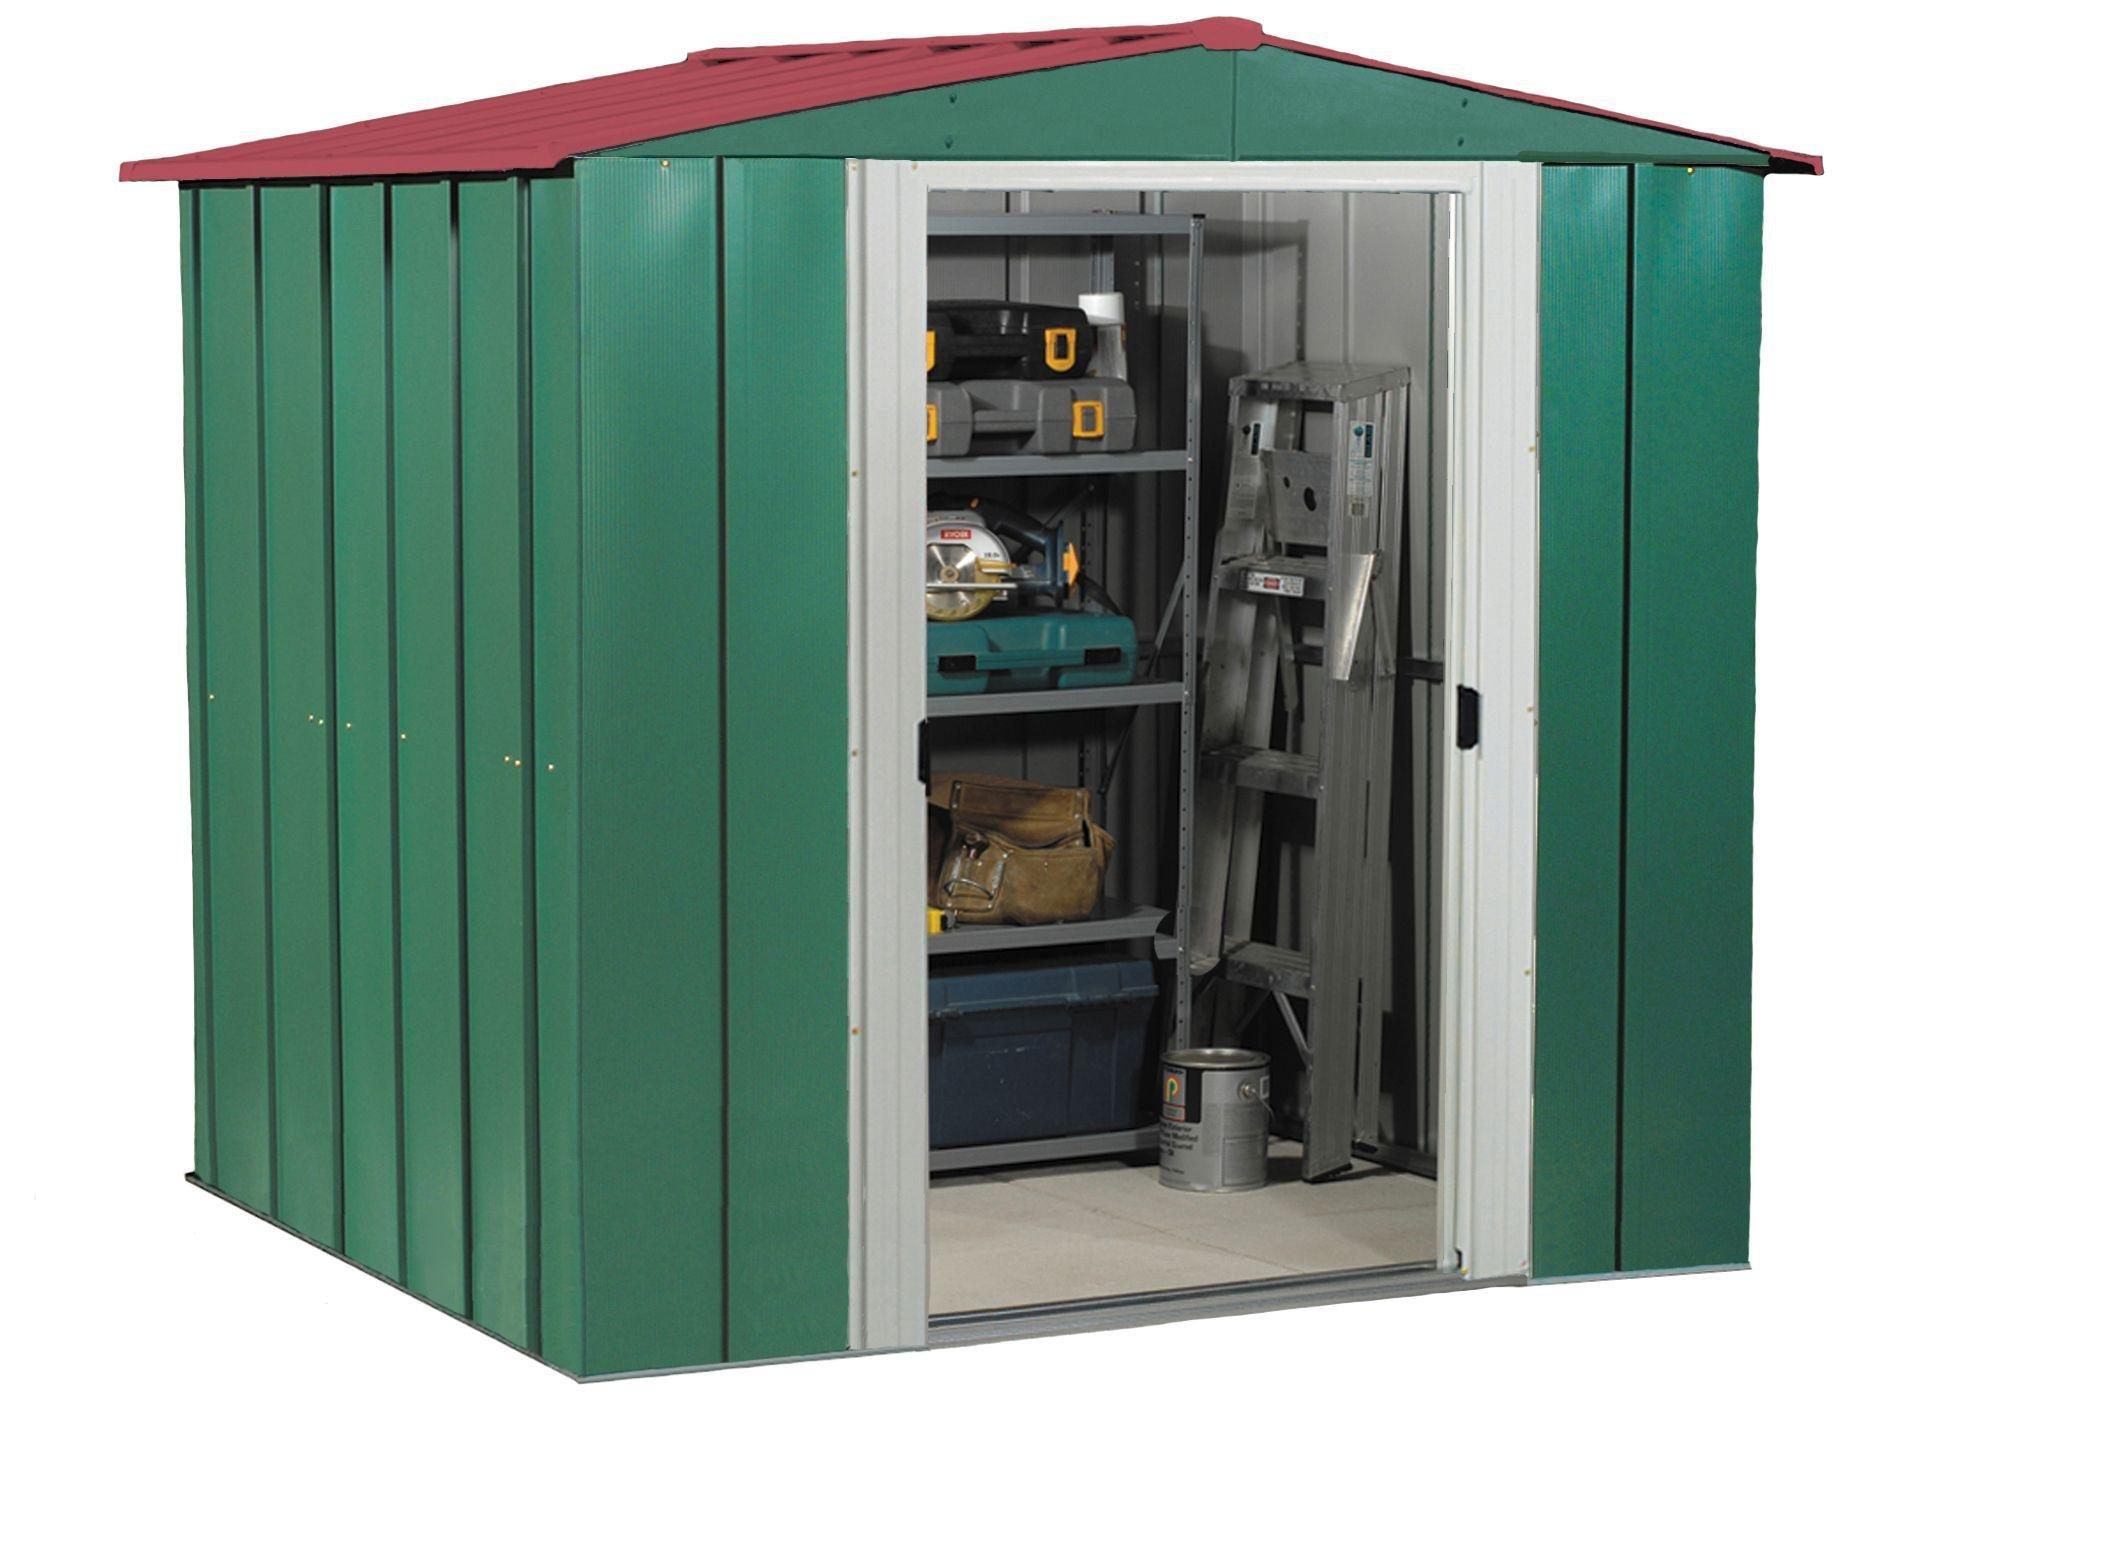 Garden Sheds Renfrewshire buy arrow metal garden shed - 6 x 5ft at argos.co.uk - your online